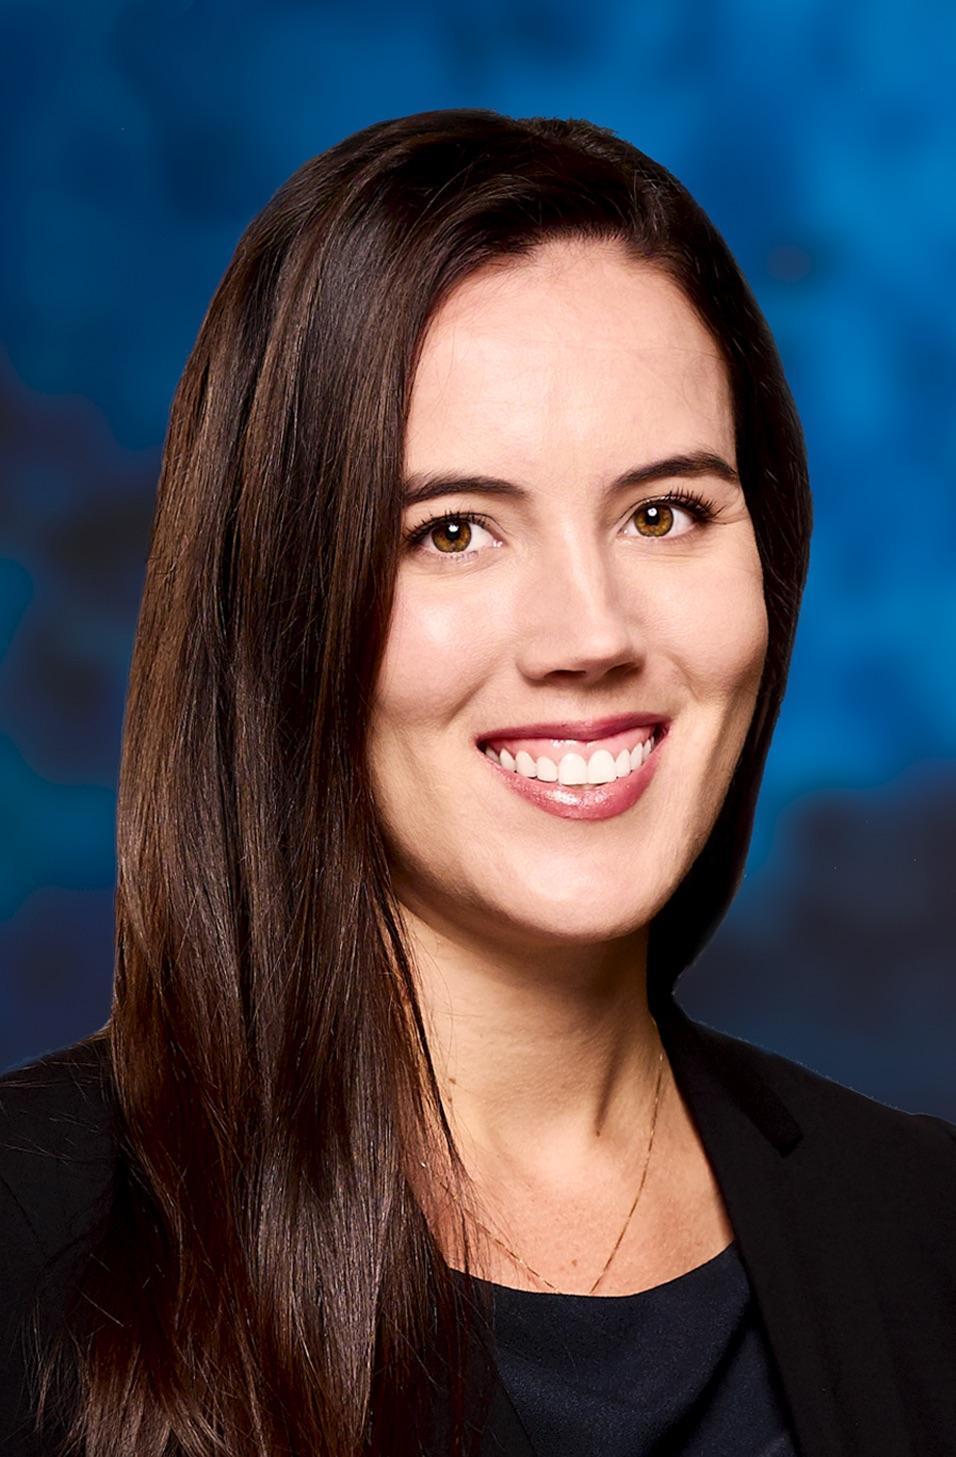 Principal Catherine Shumate